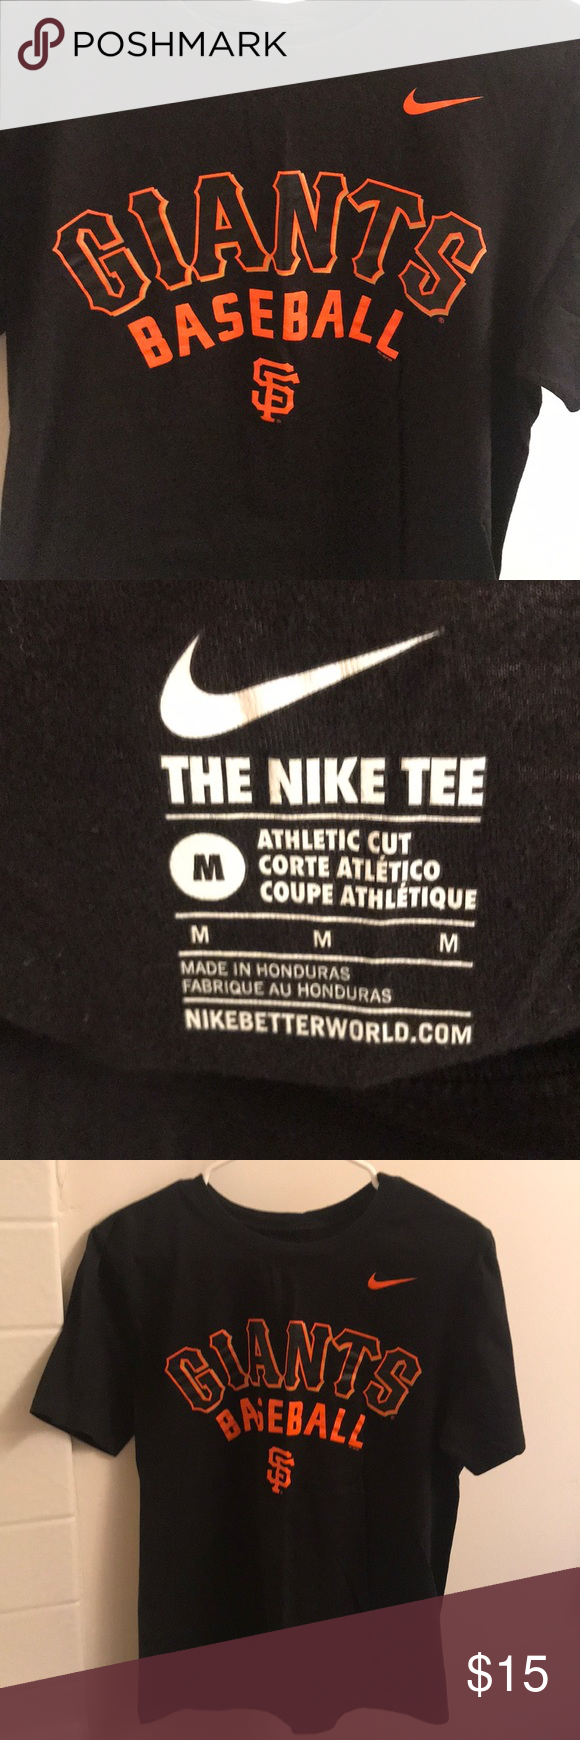 "ba3207d3 MENS Nike SF Giants T-Shirt Mens Nike Medium ""Athletic Cut"" T-Shirt, runs  small but in great condition Shirts Tees - Short Sleeve"